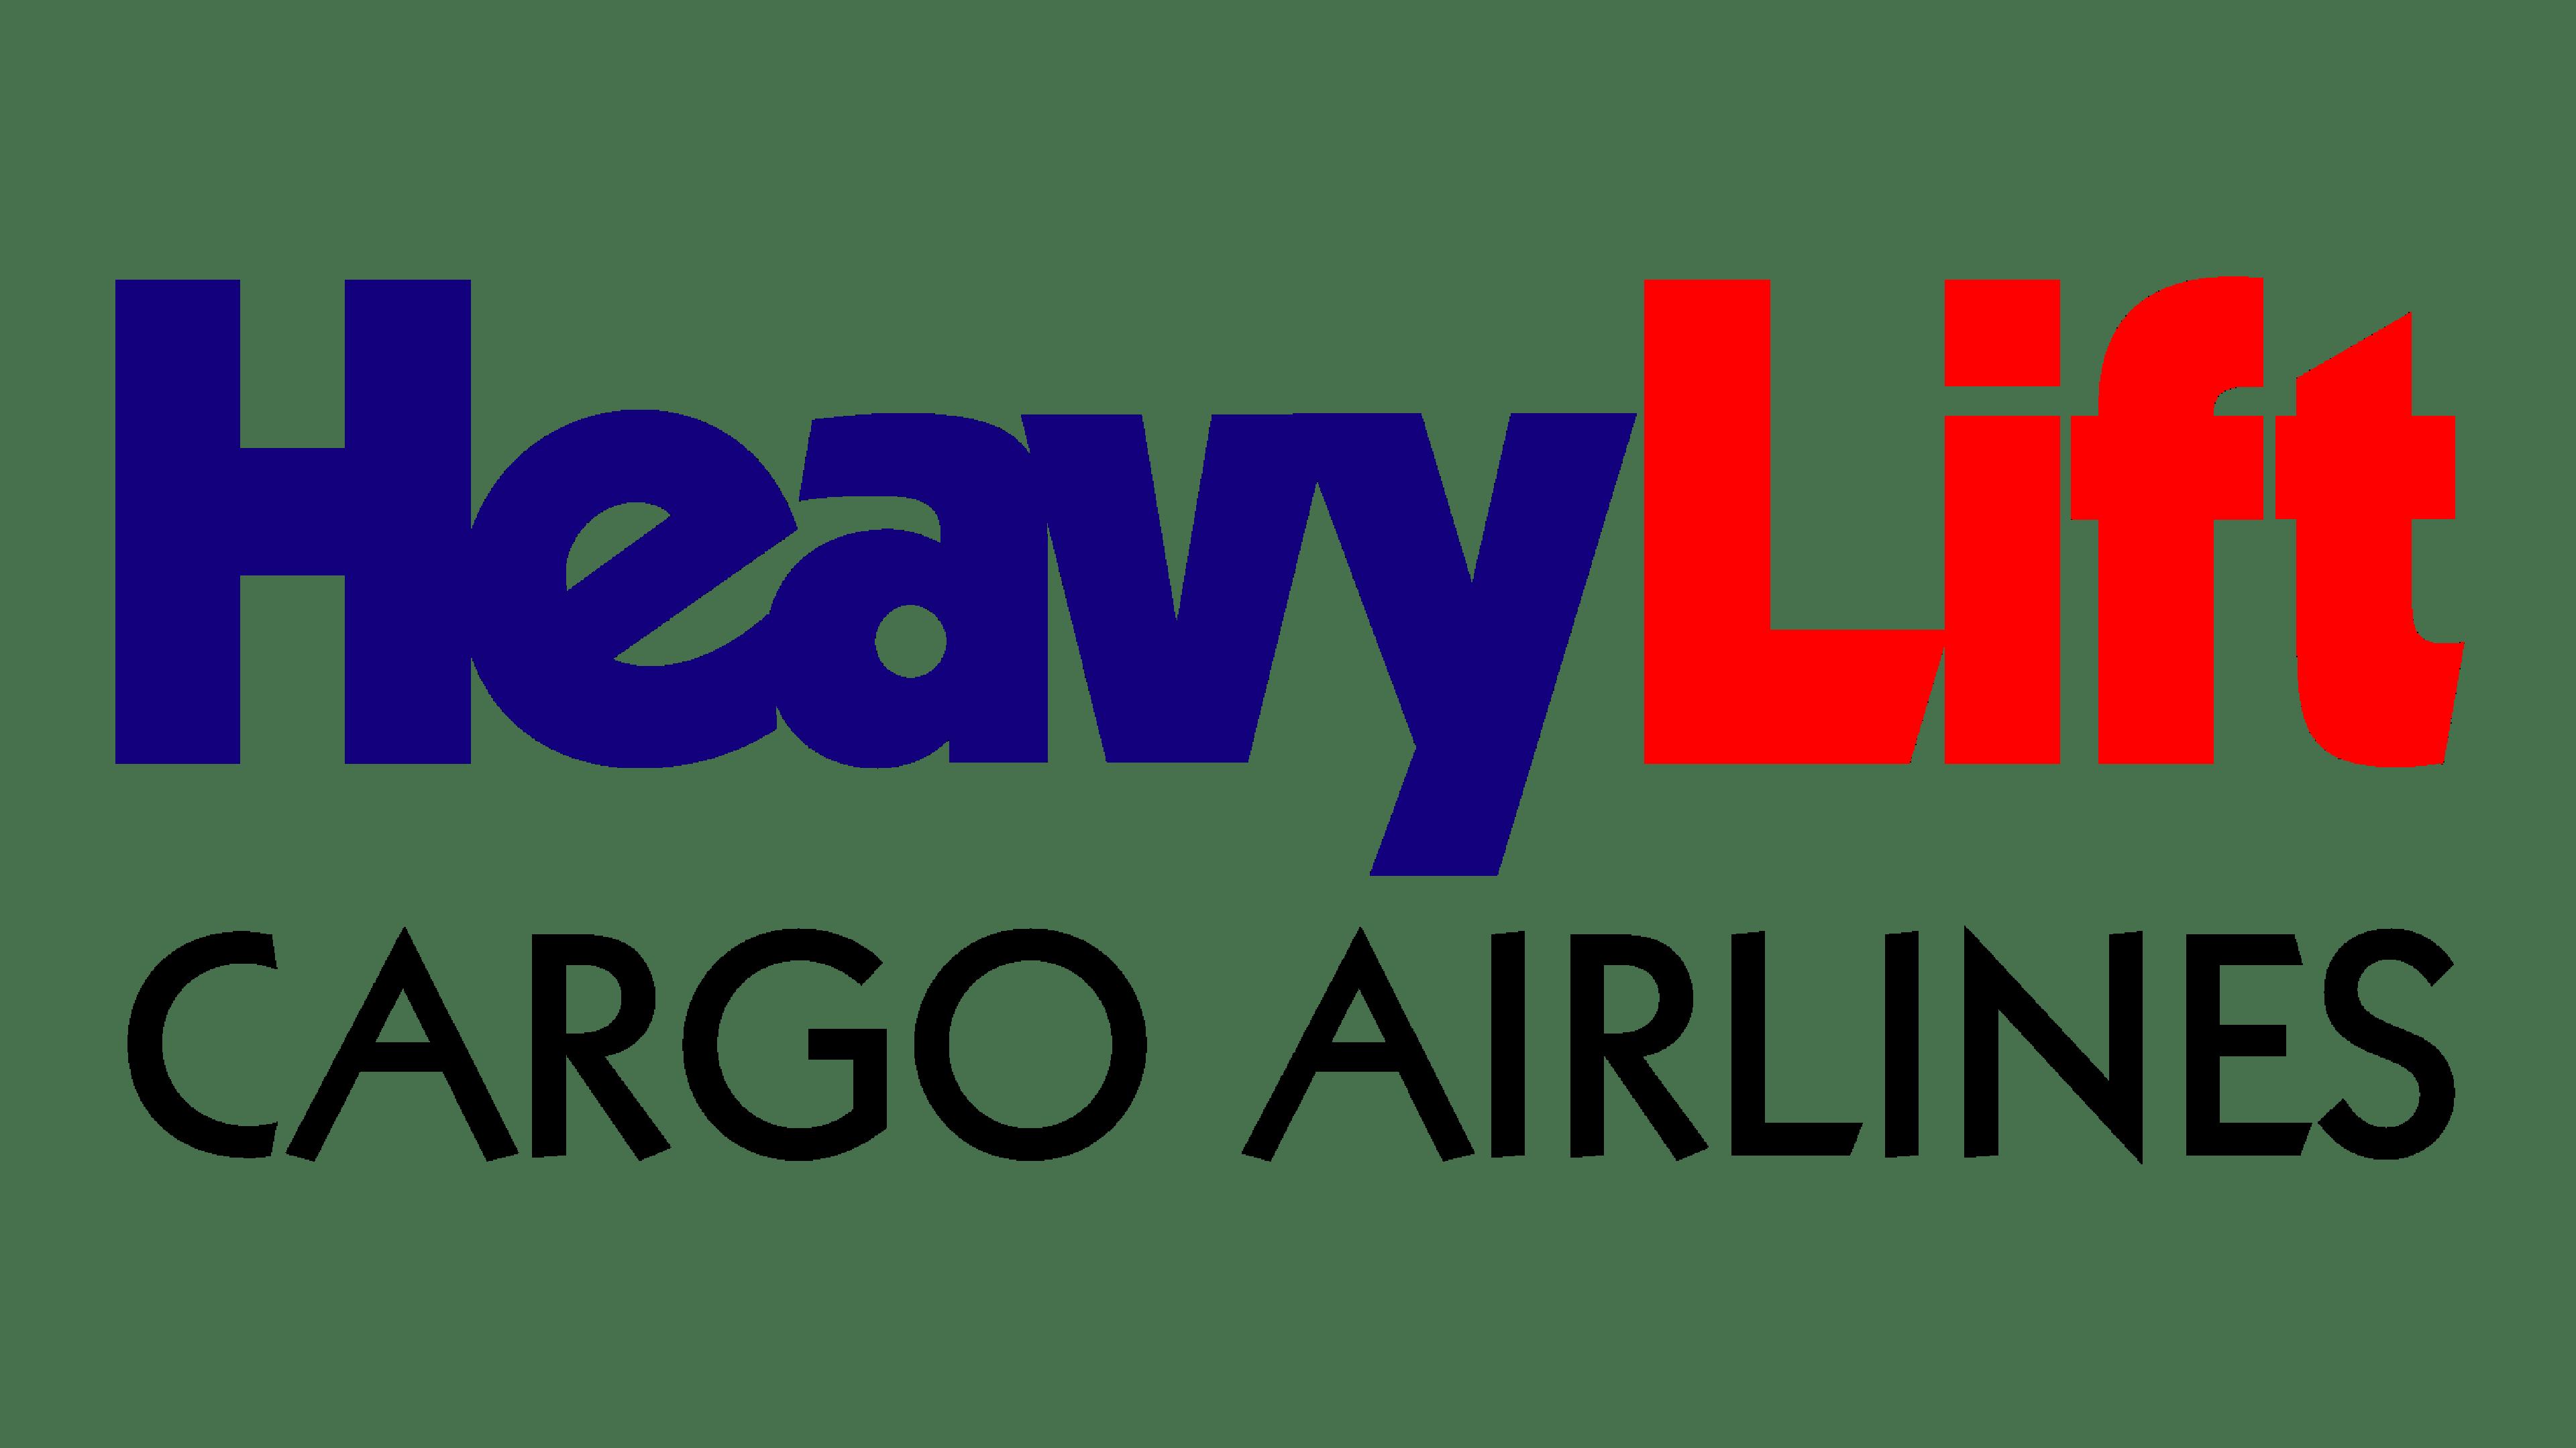 HeavyLift Cargo Airlines Logo Logo